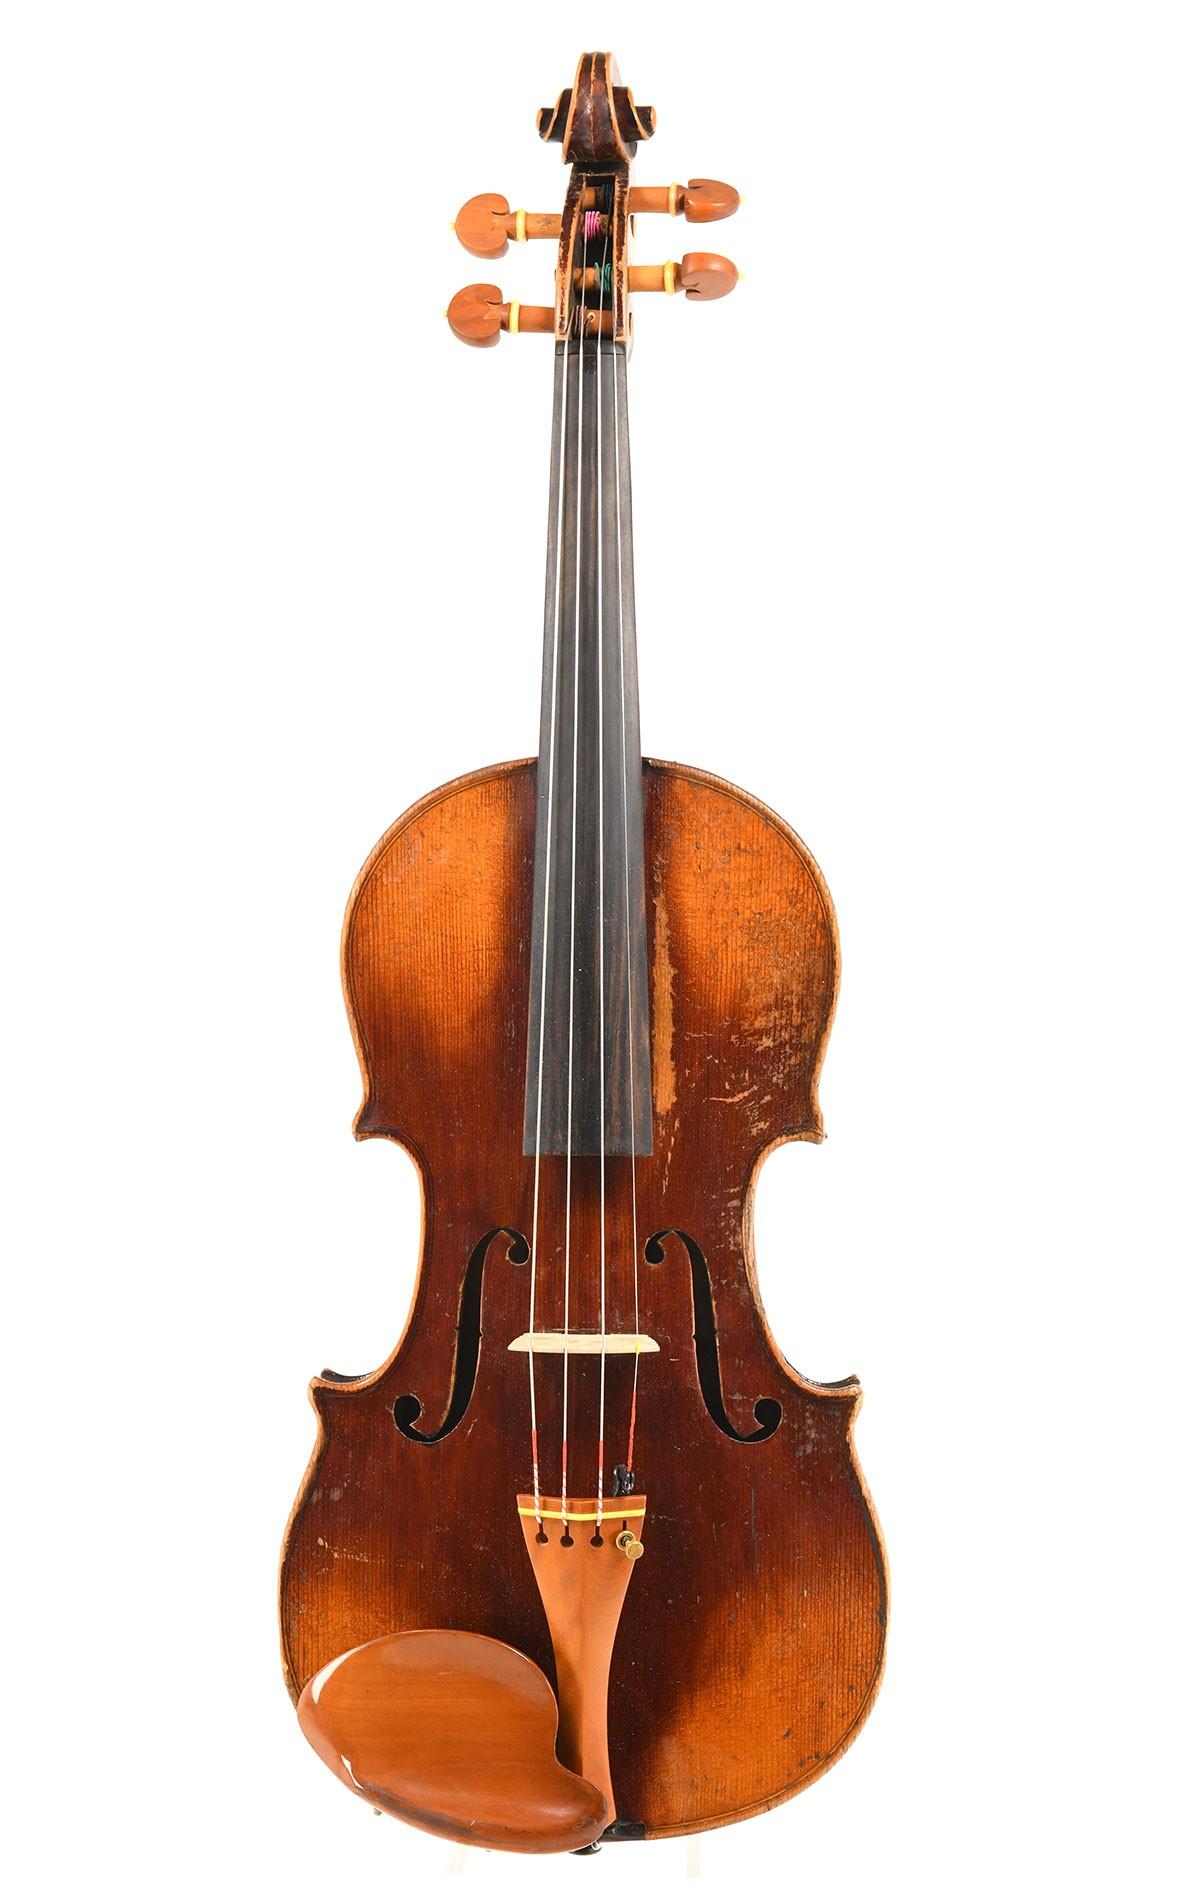 Old Saxon violin, around 1880